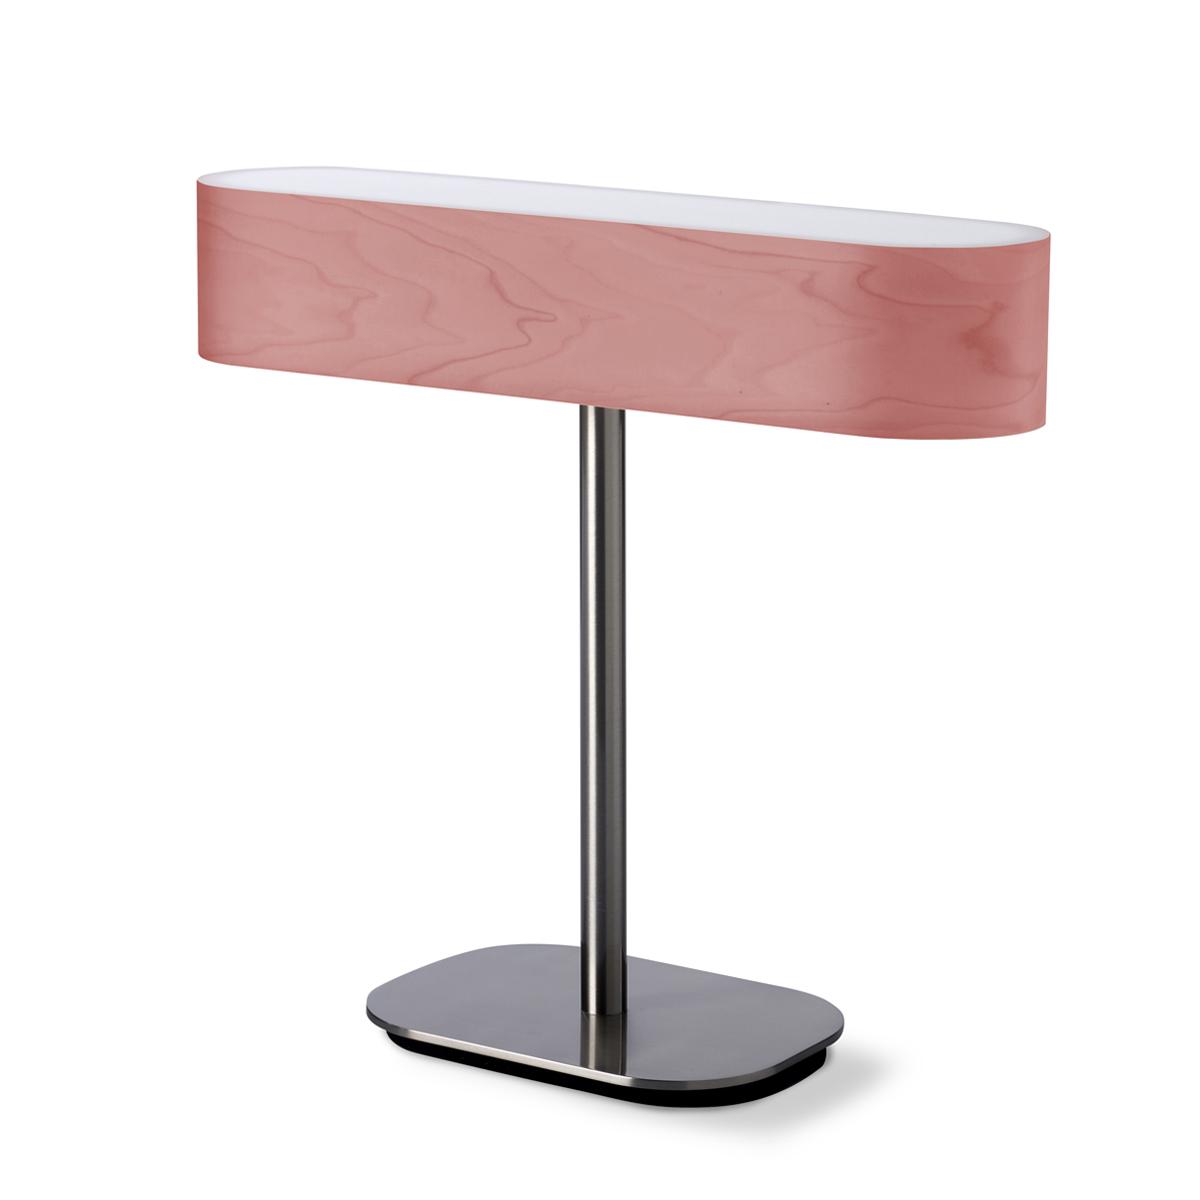 LZF Lamps I-Club LED Tischleuchte I M LED DIM 33